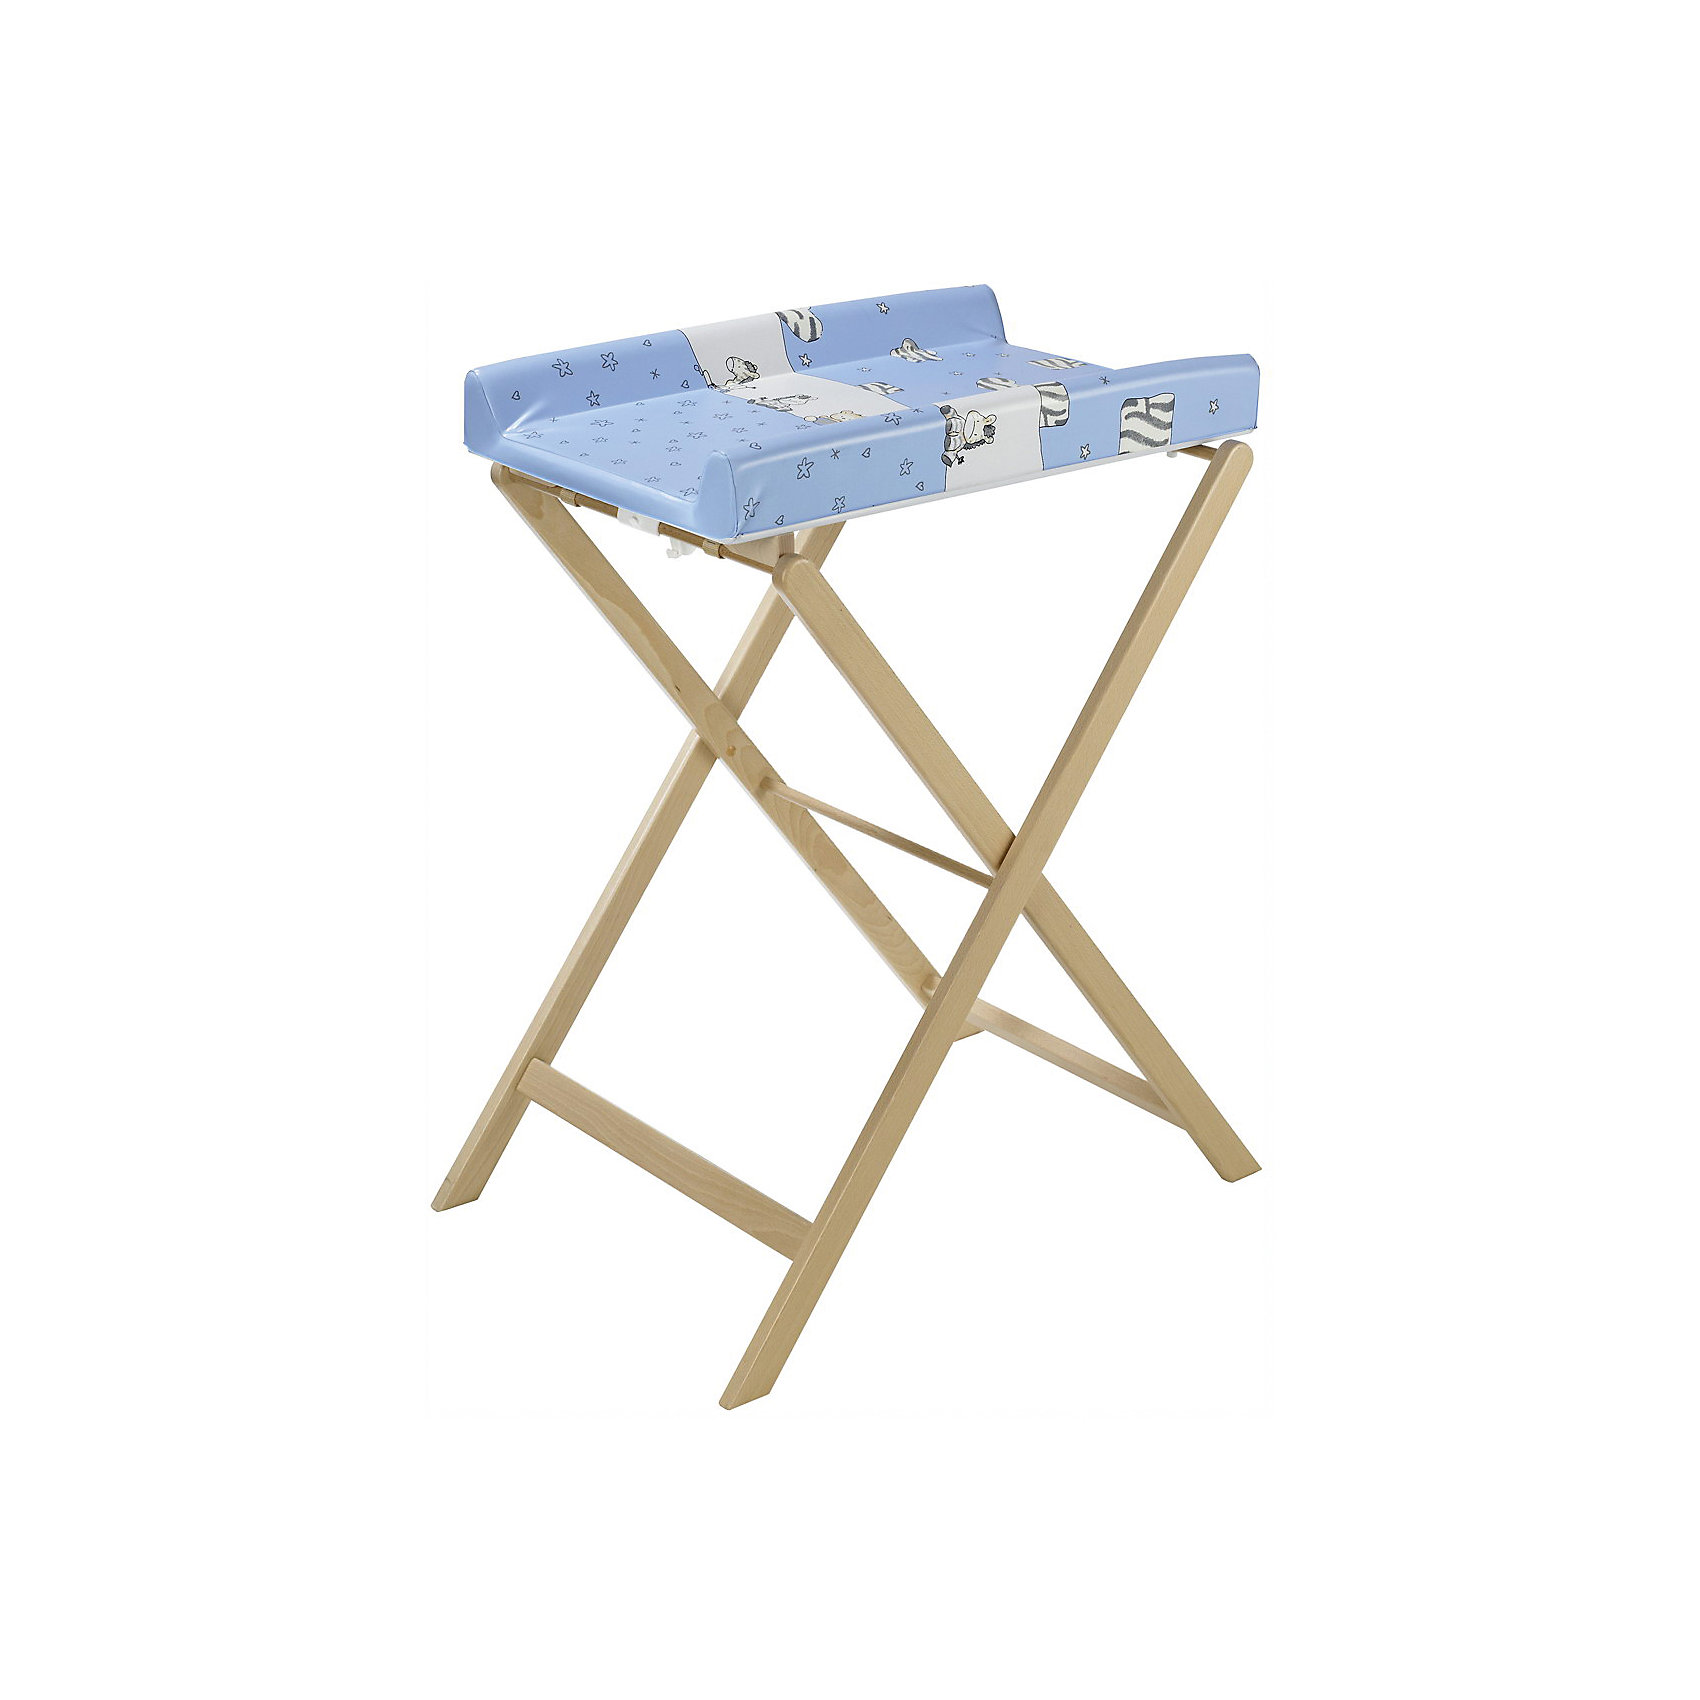 Geuther Пеленальный столик TRIXI 4817 NA 97, Geuther, натуральный